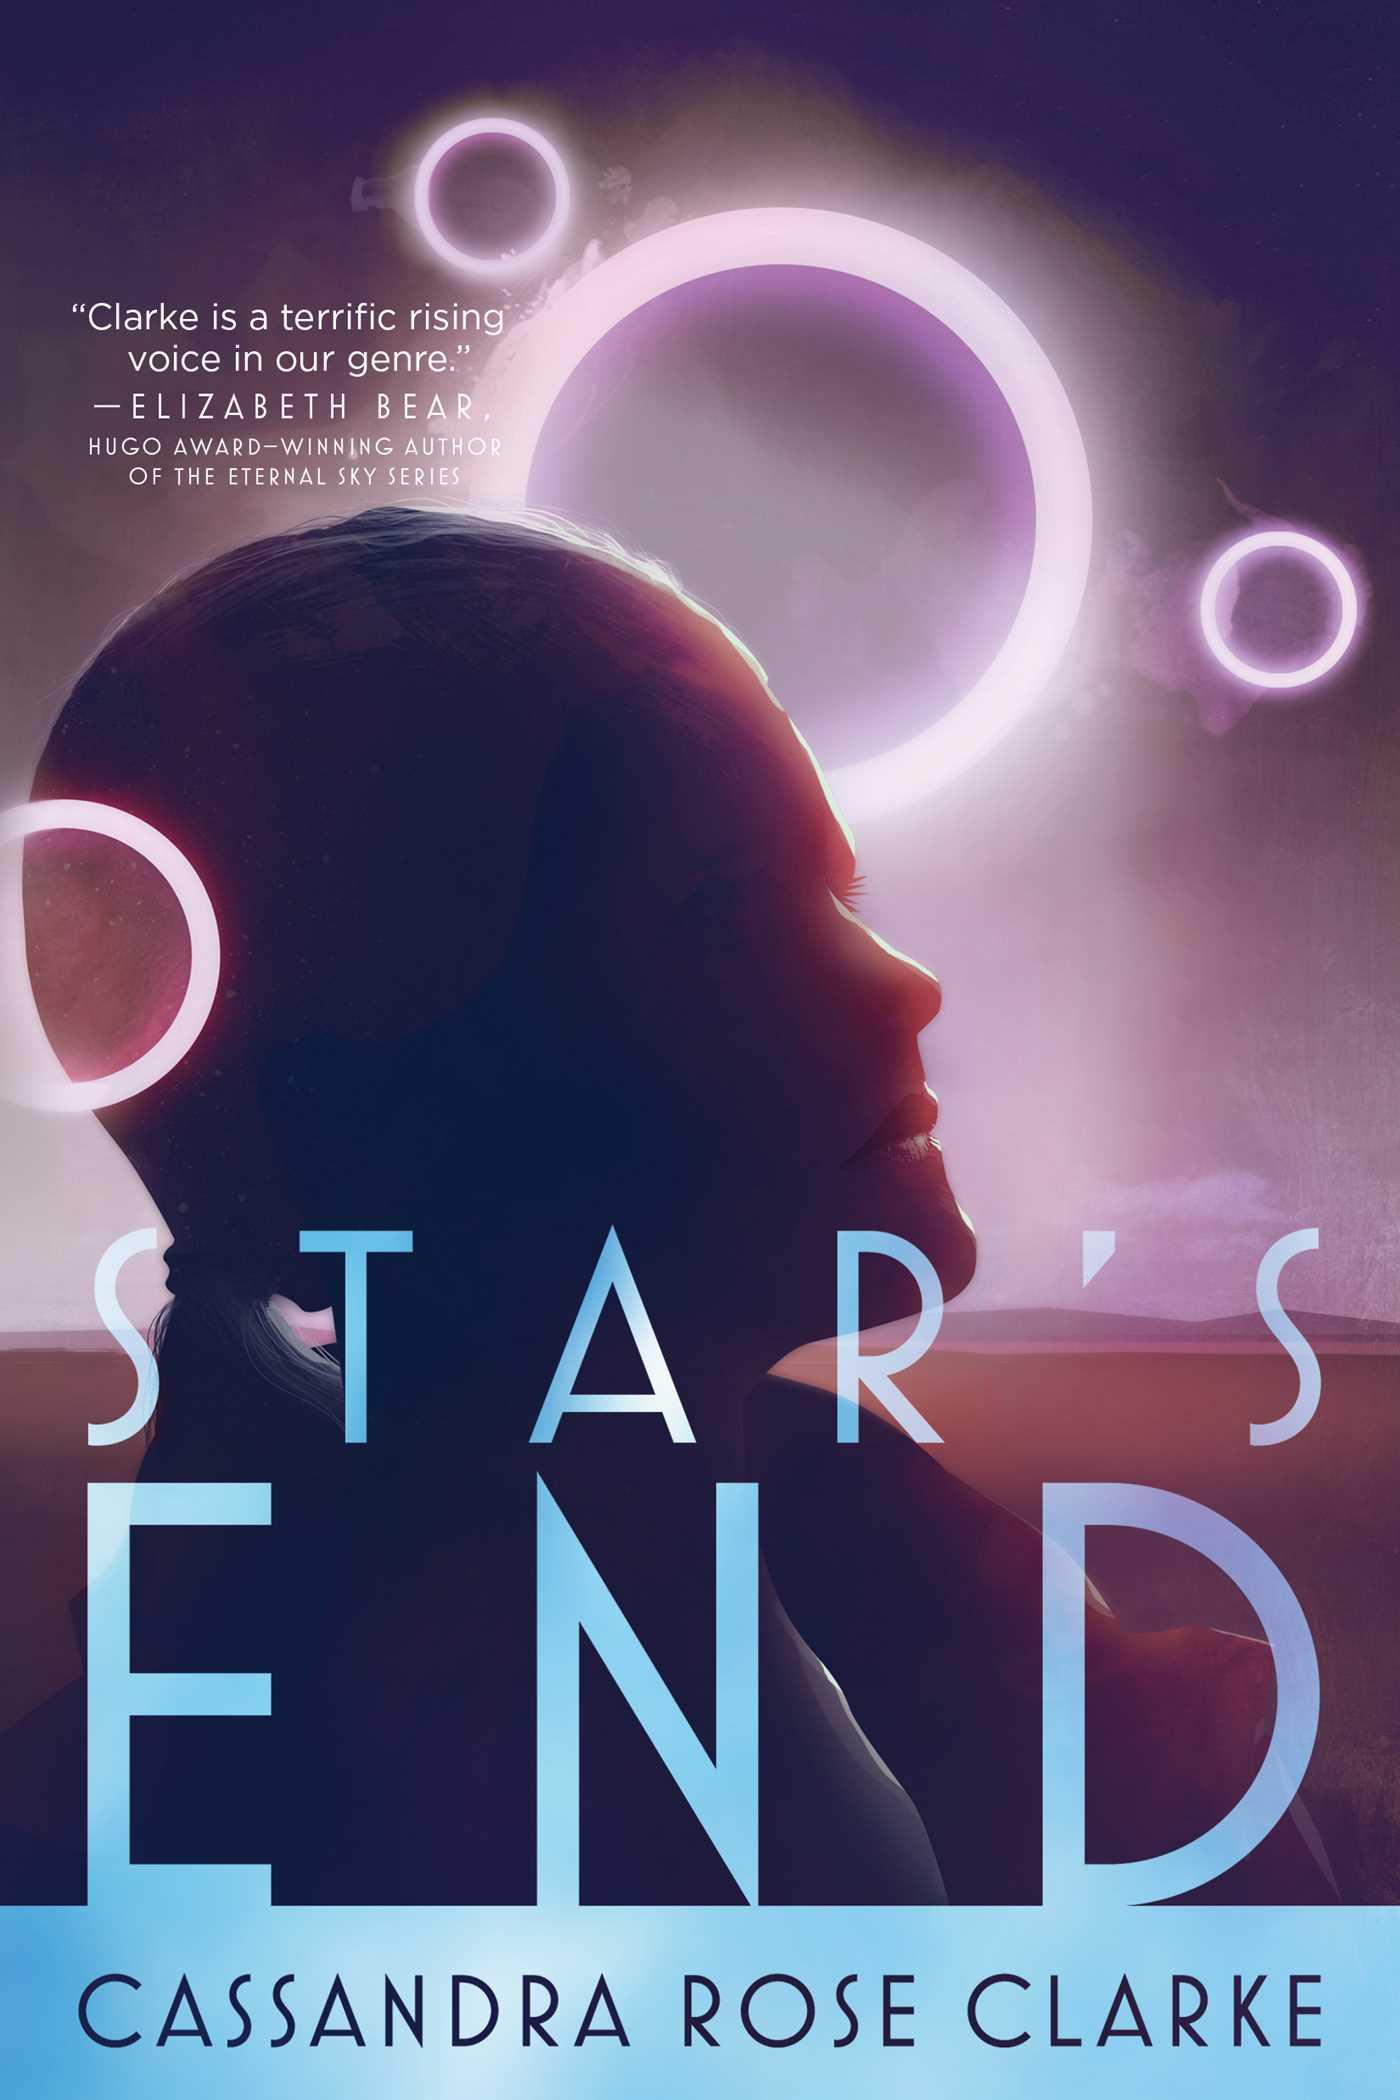 Stars end 9781481444309 hr